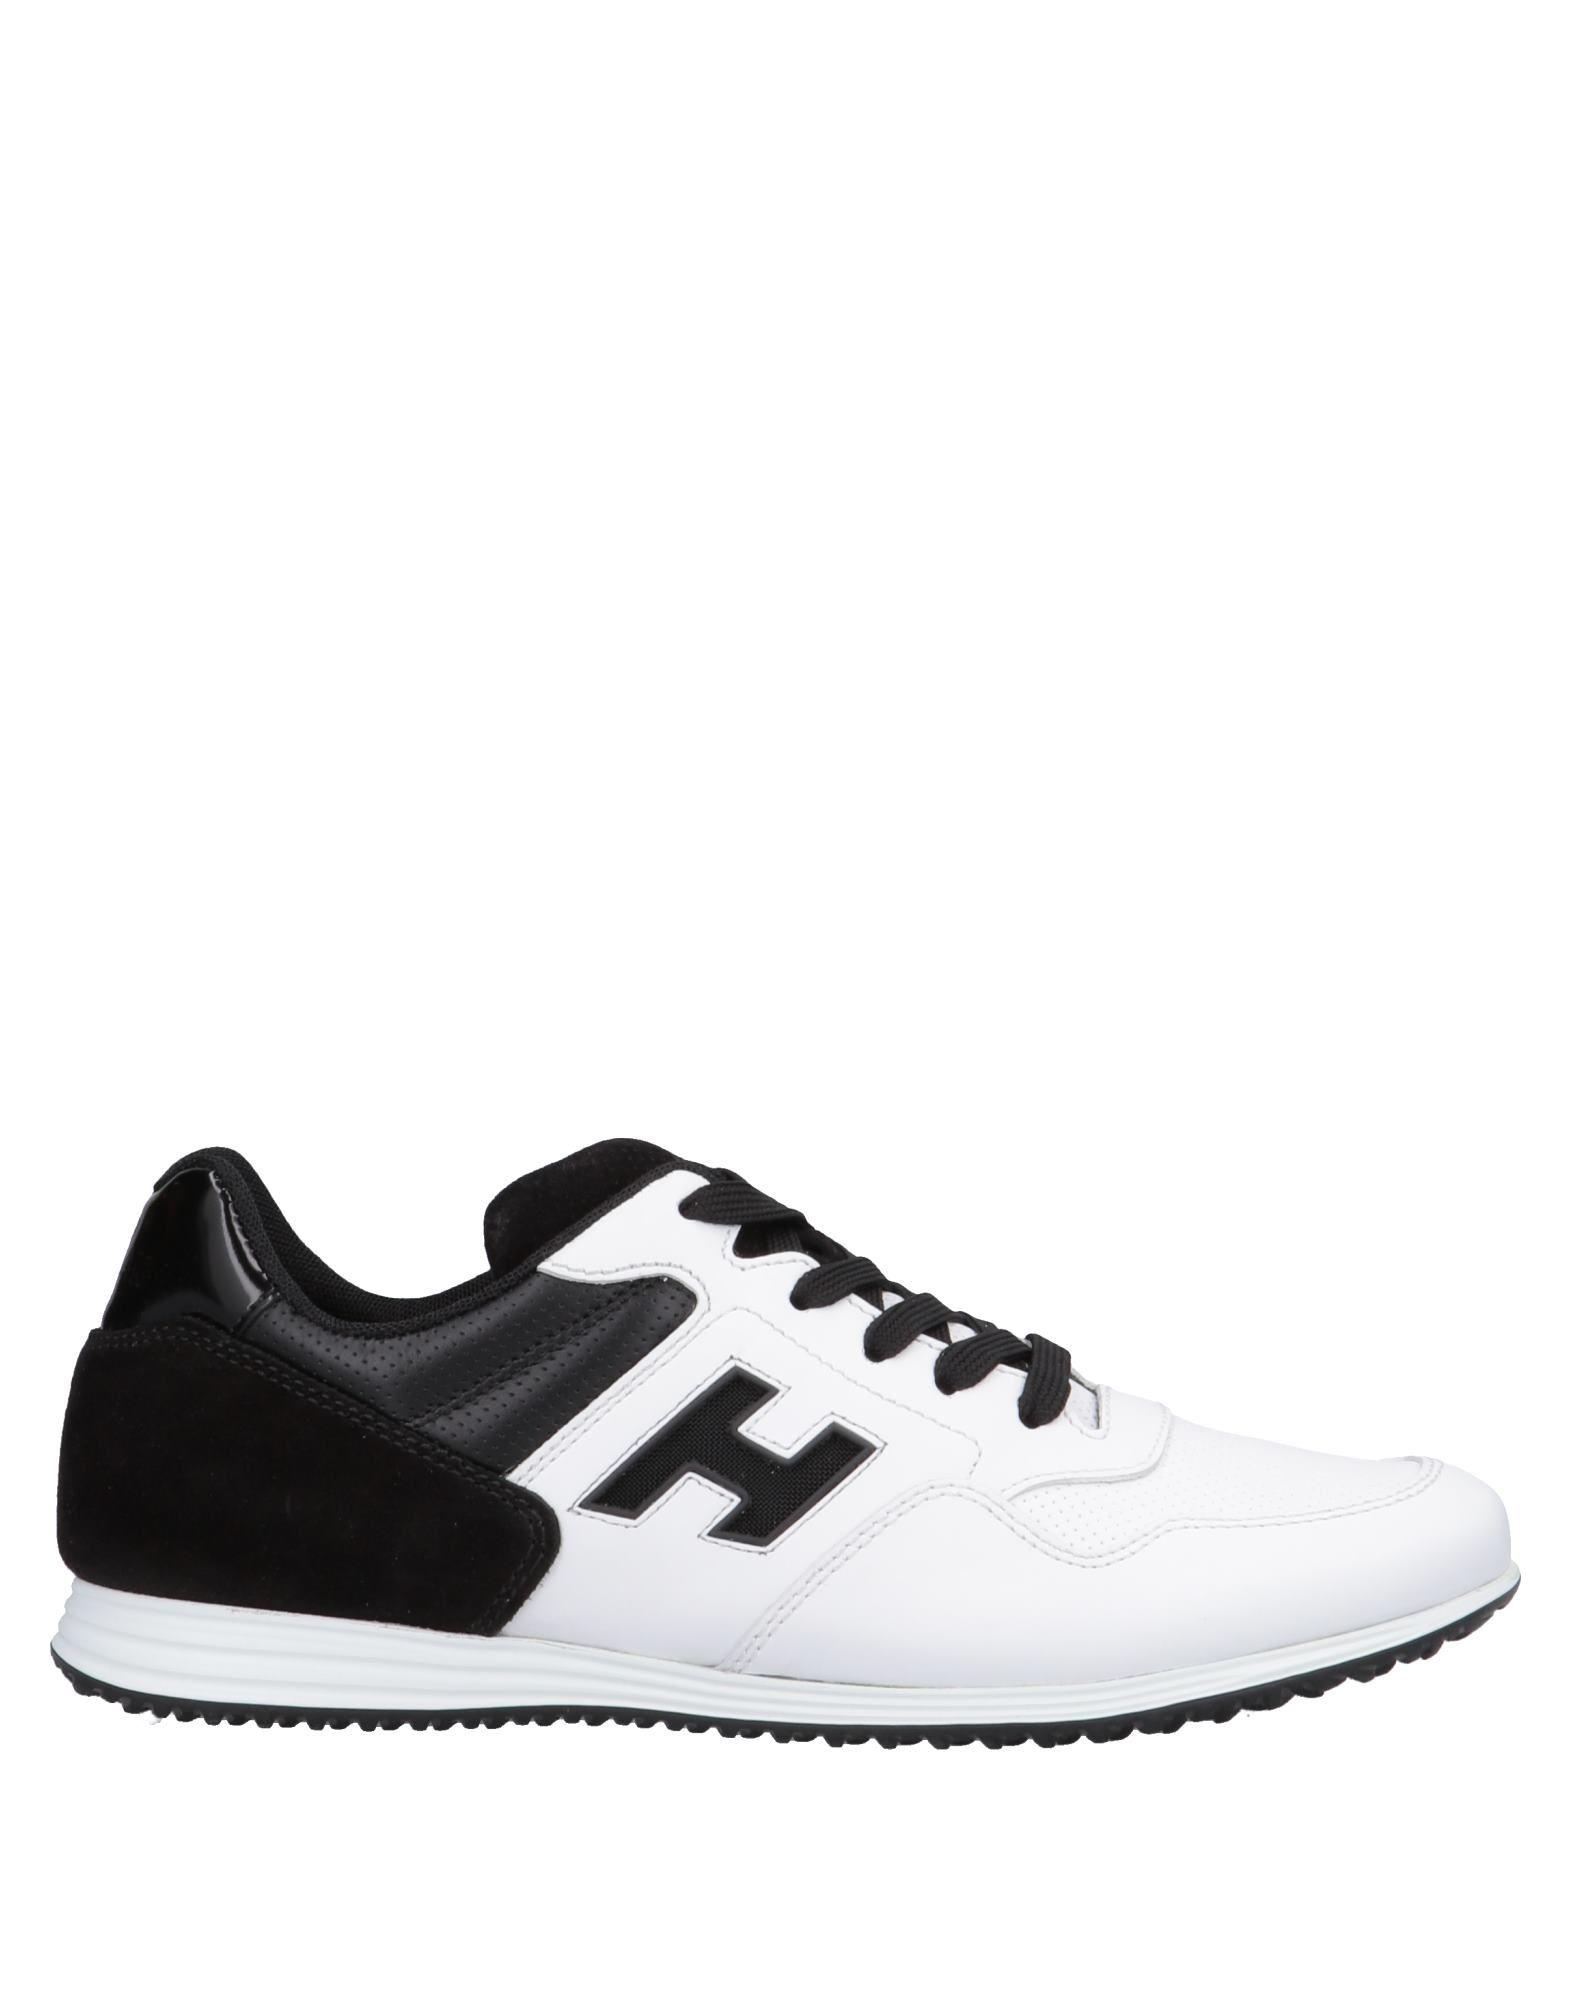 Hogan Sneakers Herren  11563969AT Gute Qualität beliebte Schuhe